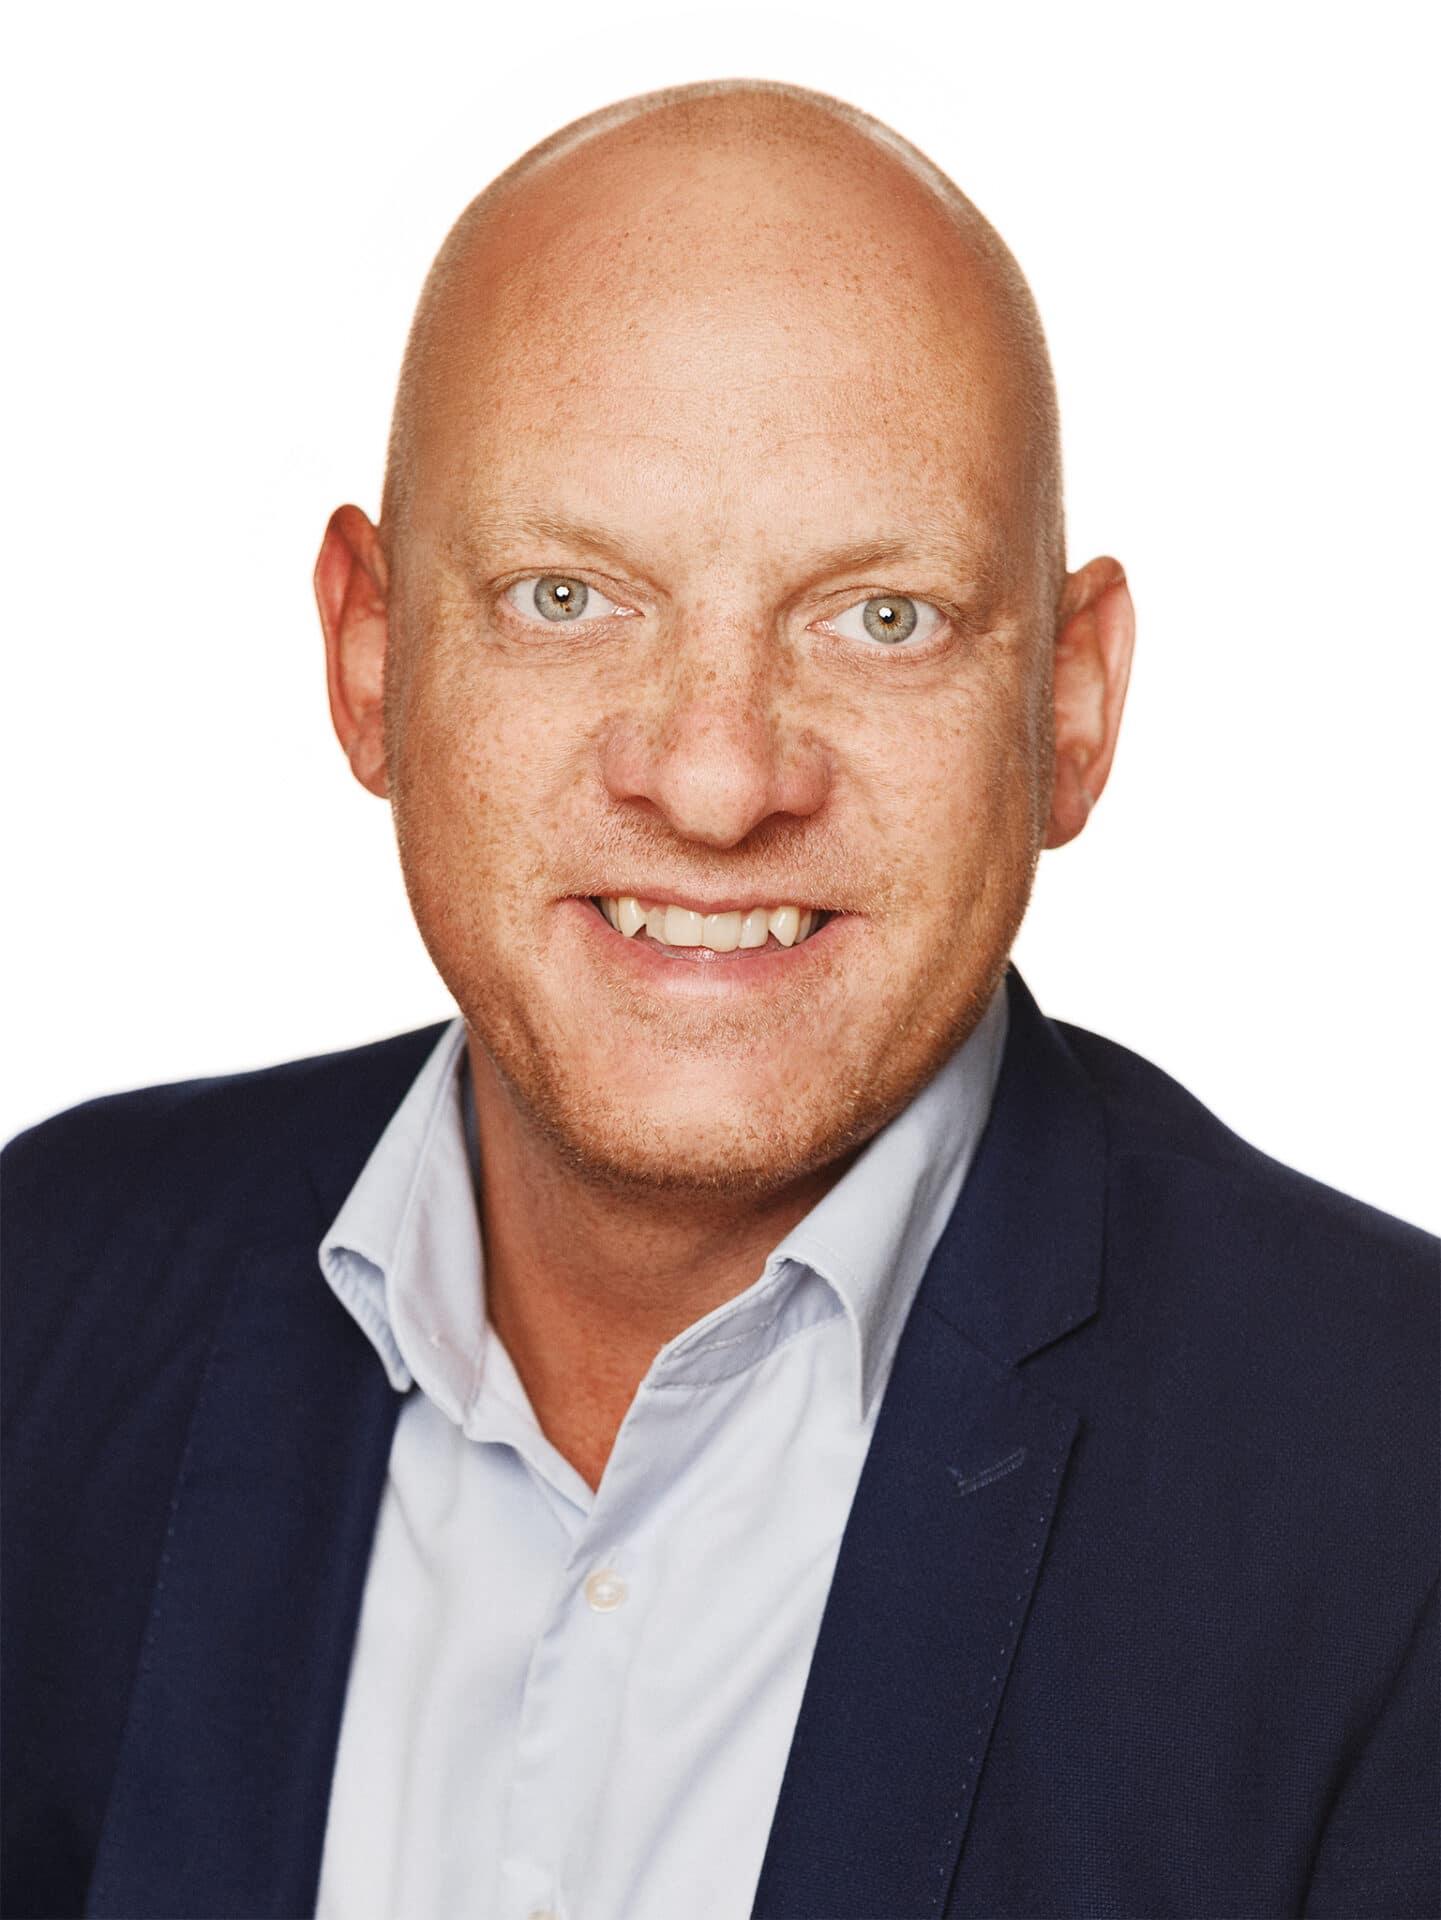 Per Bellerby Stenbæk